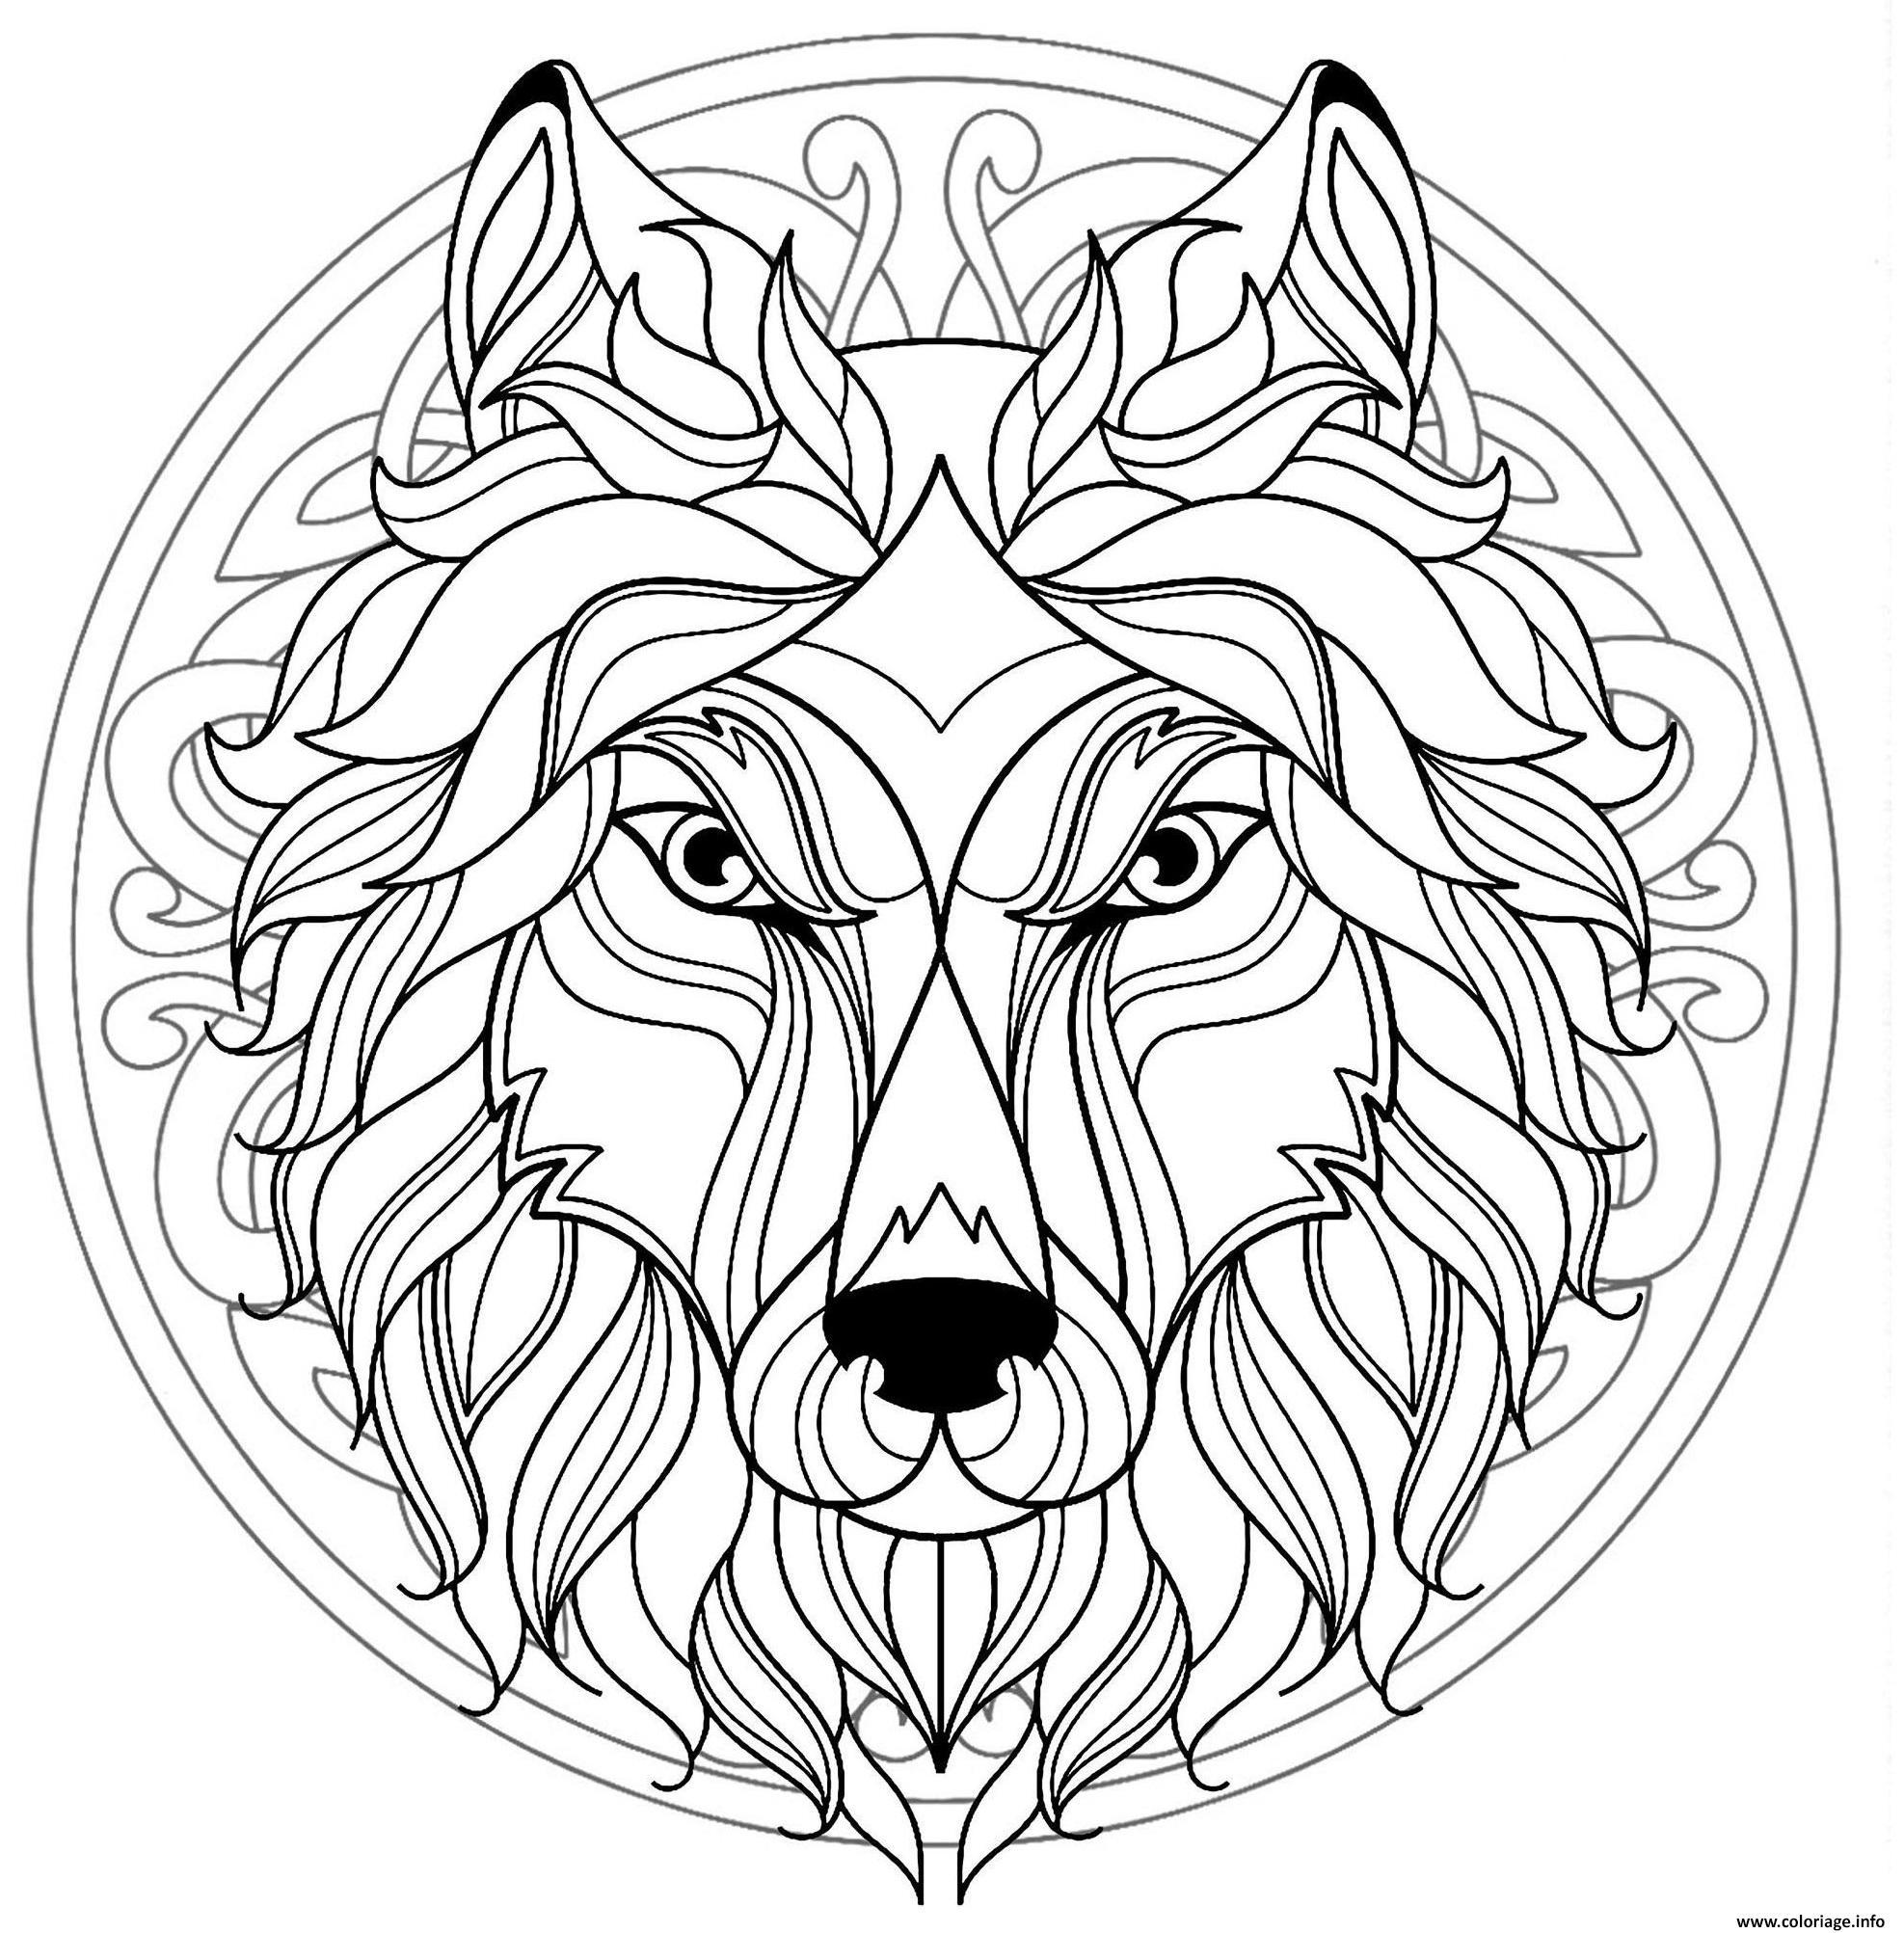 Coloriage Mandala Tete Loup Canis Lupus Dessin Mandala à ...